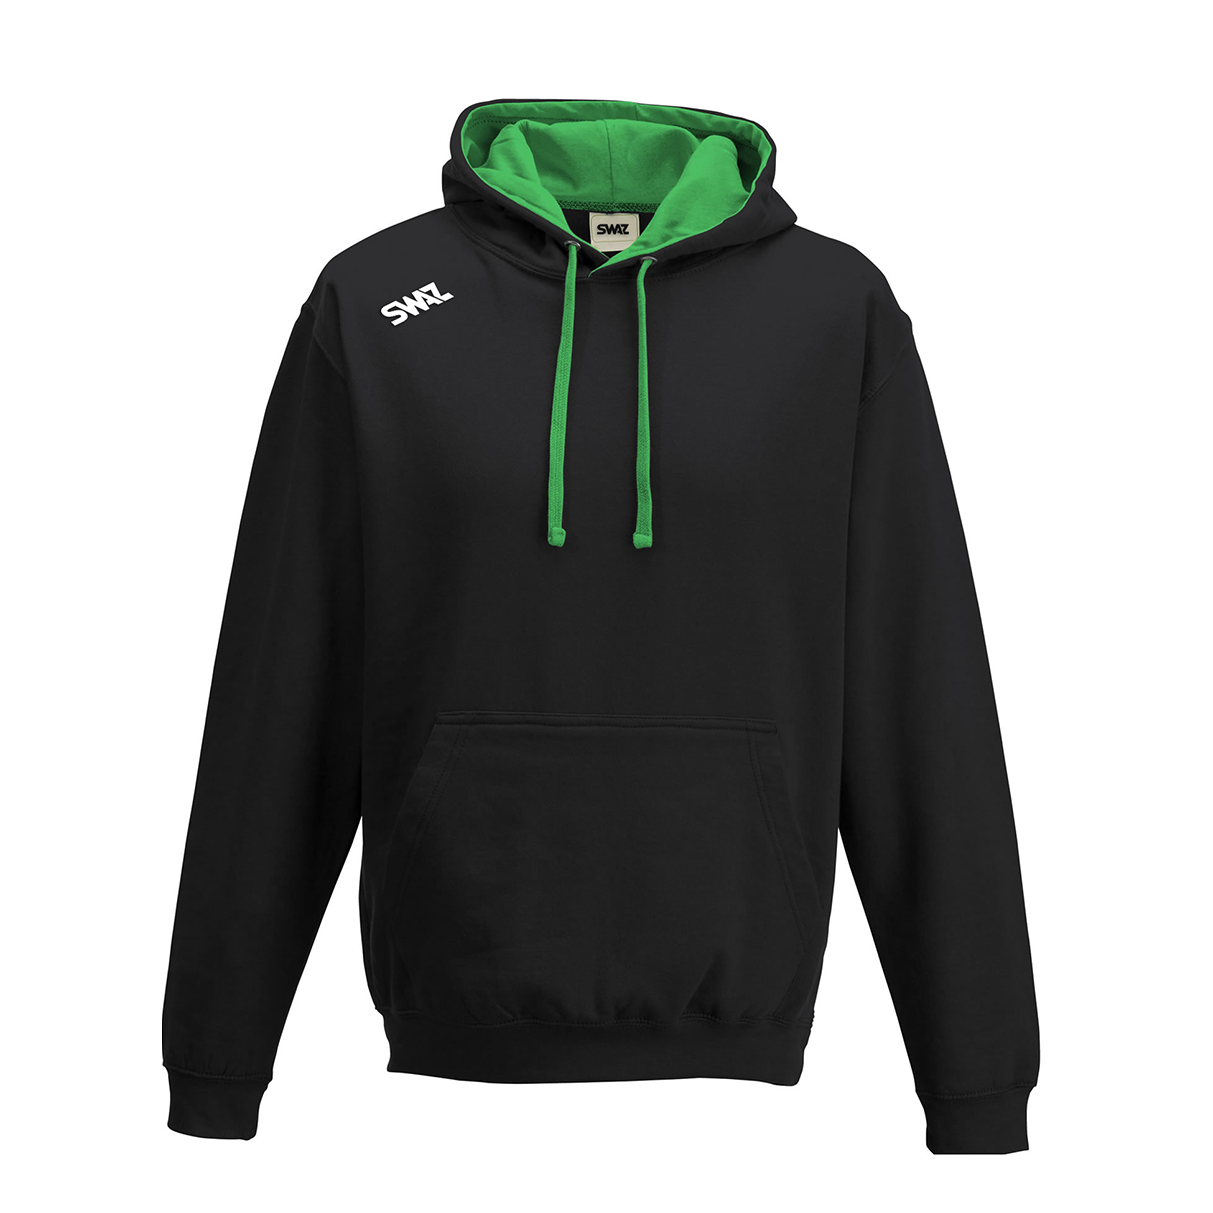 SWAZ Club Hoody – Black/Green